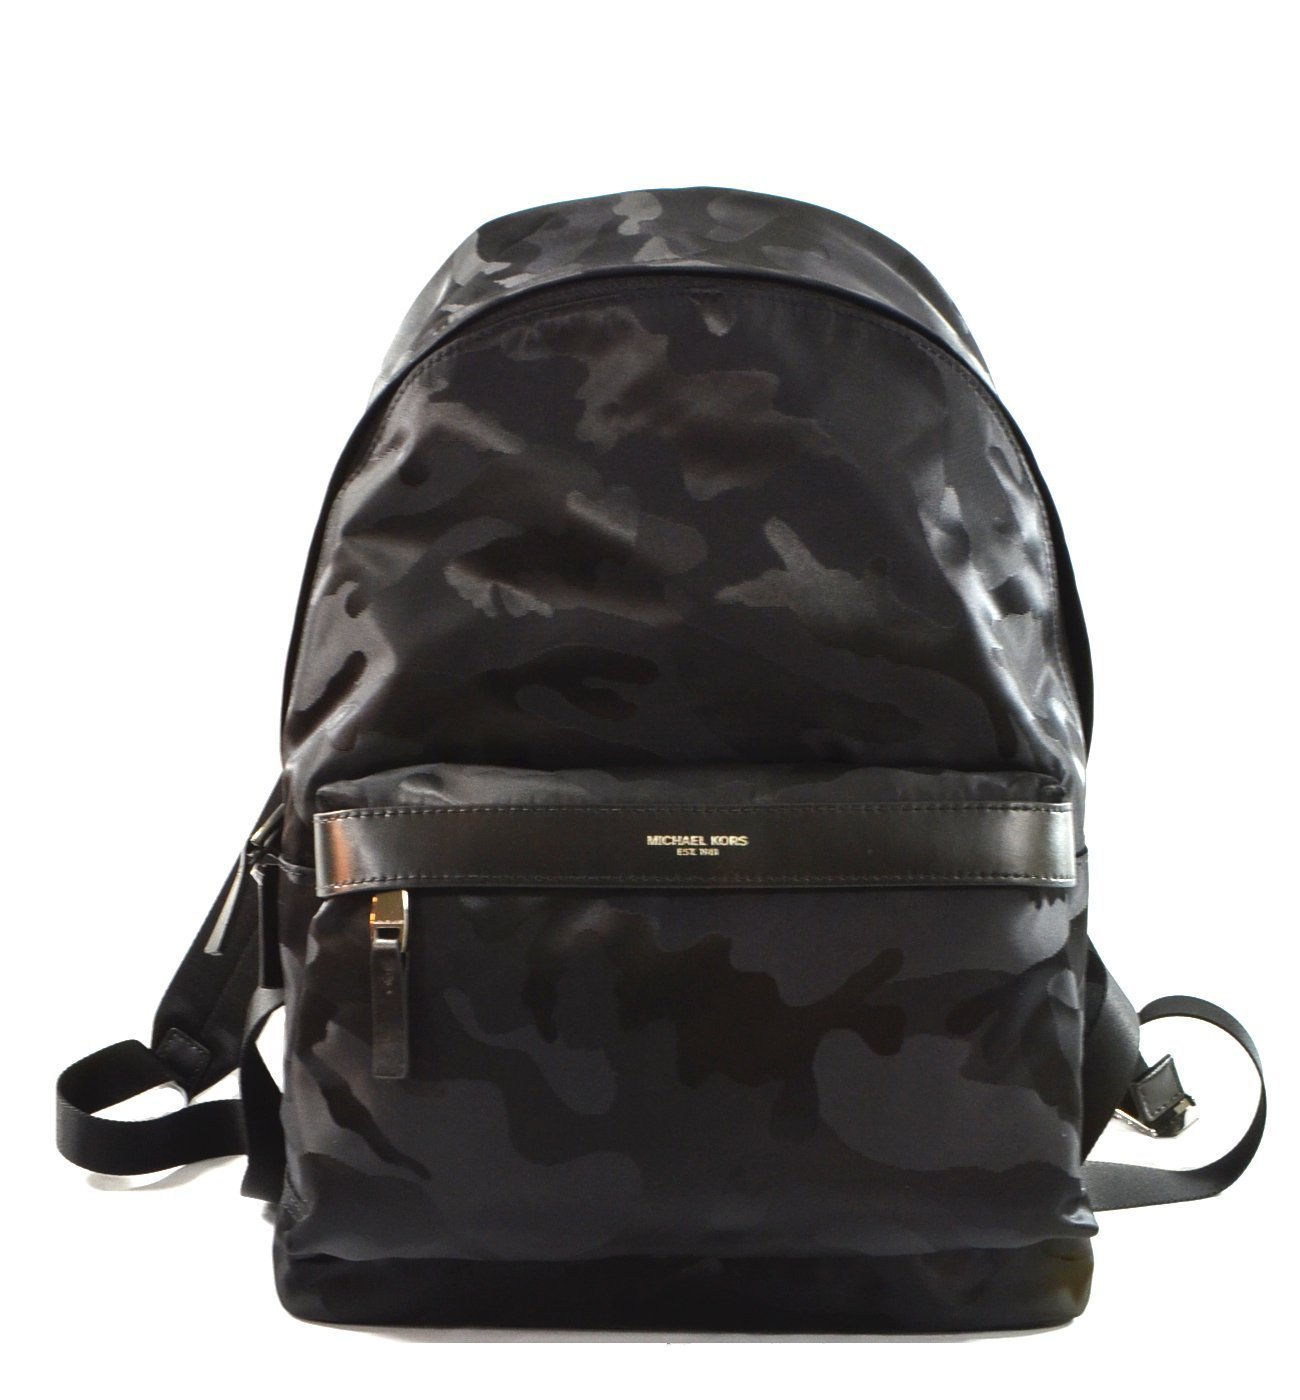 Michael Kors Backpack School Camouflage